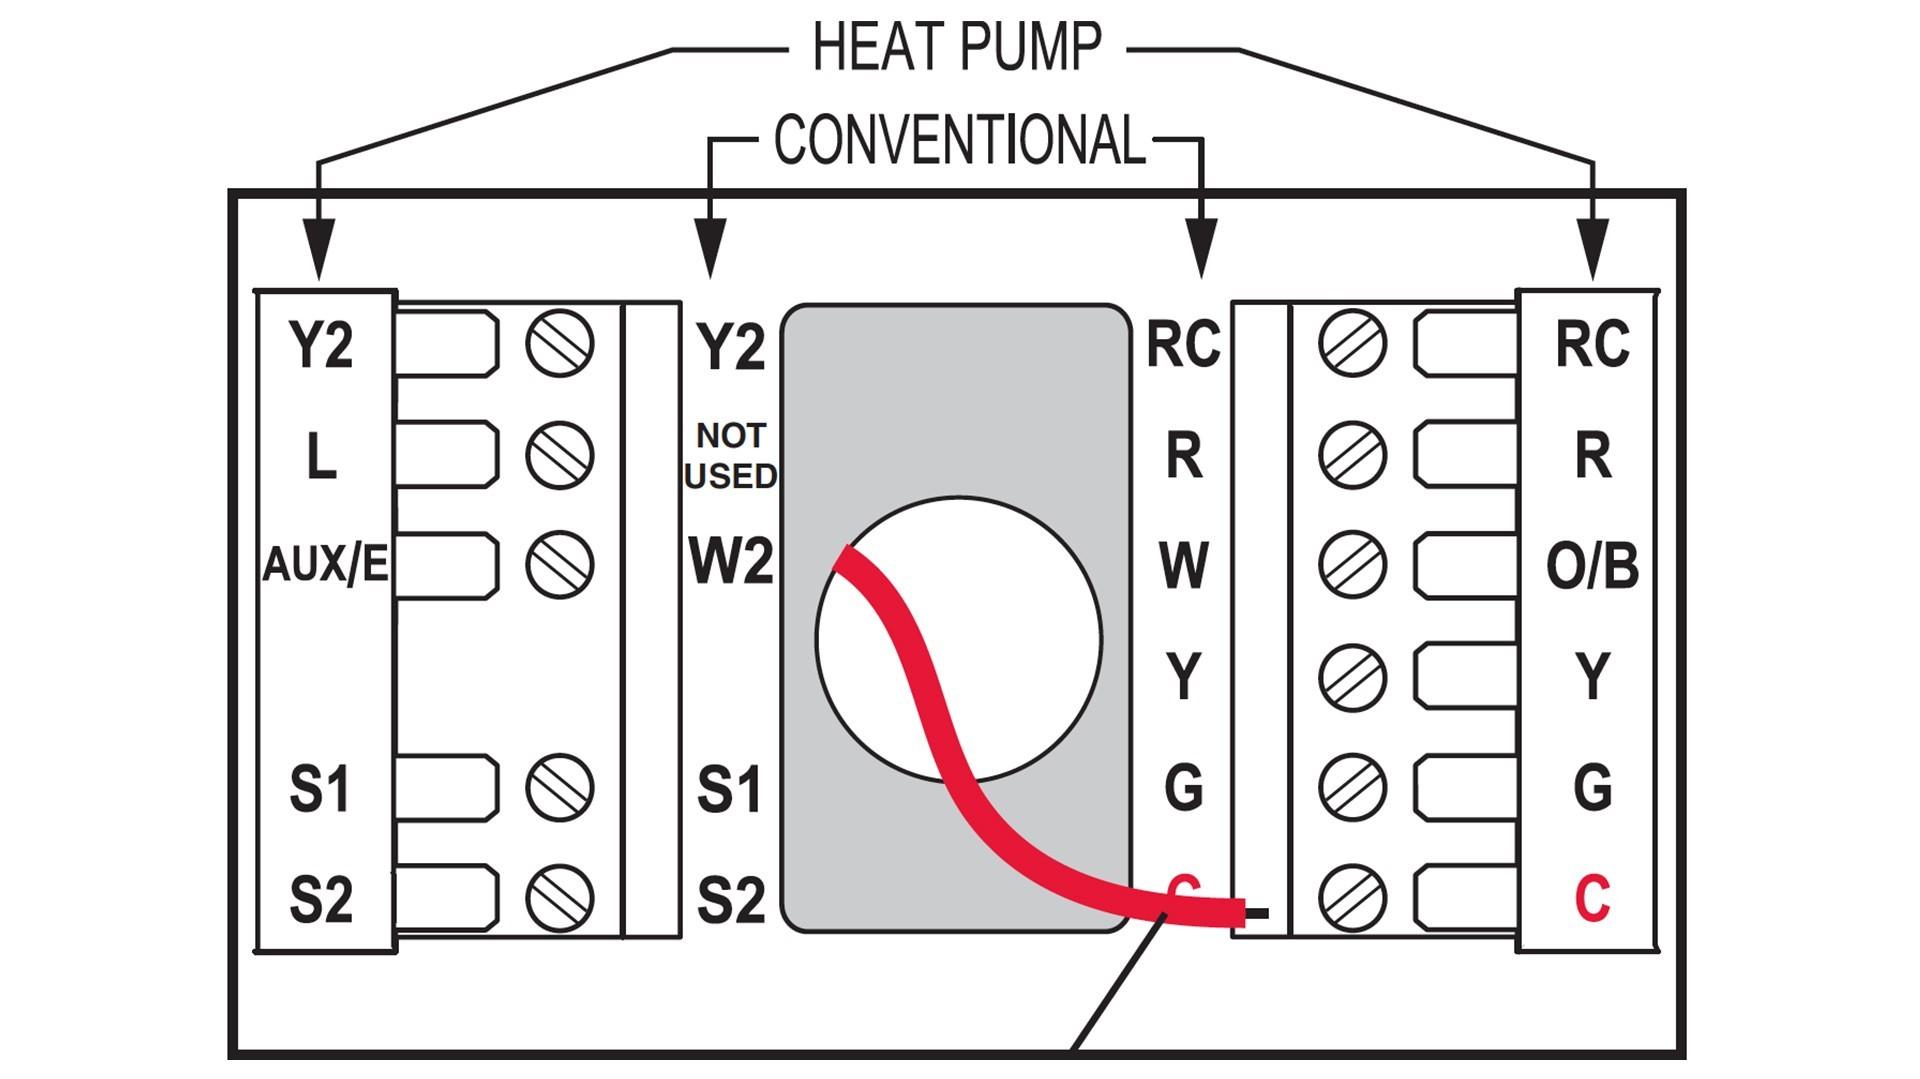 Heat pump thermostat wiring diagram goodman